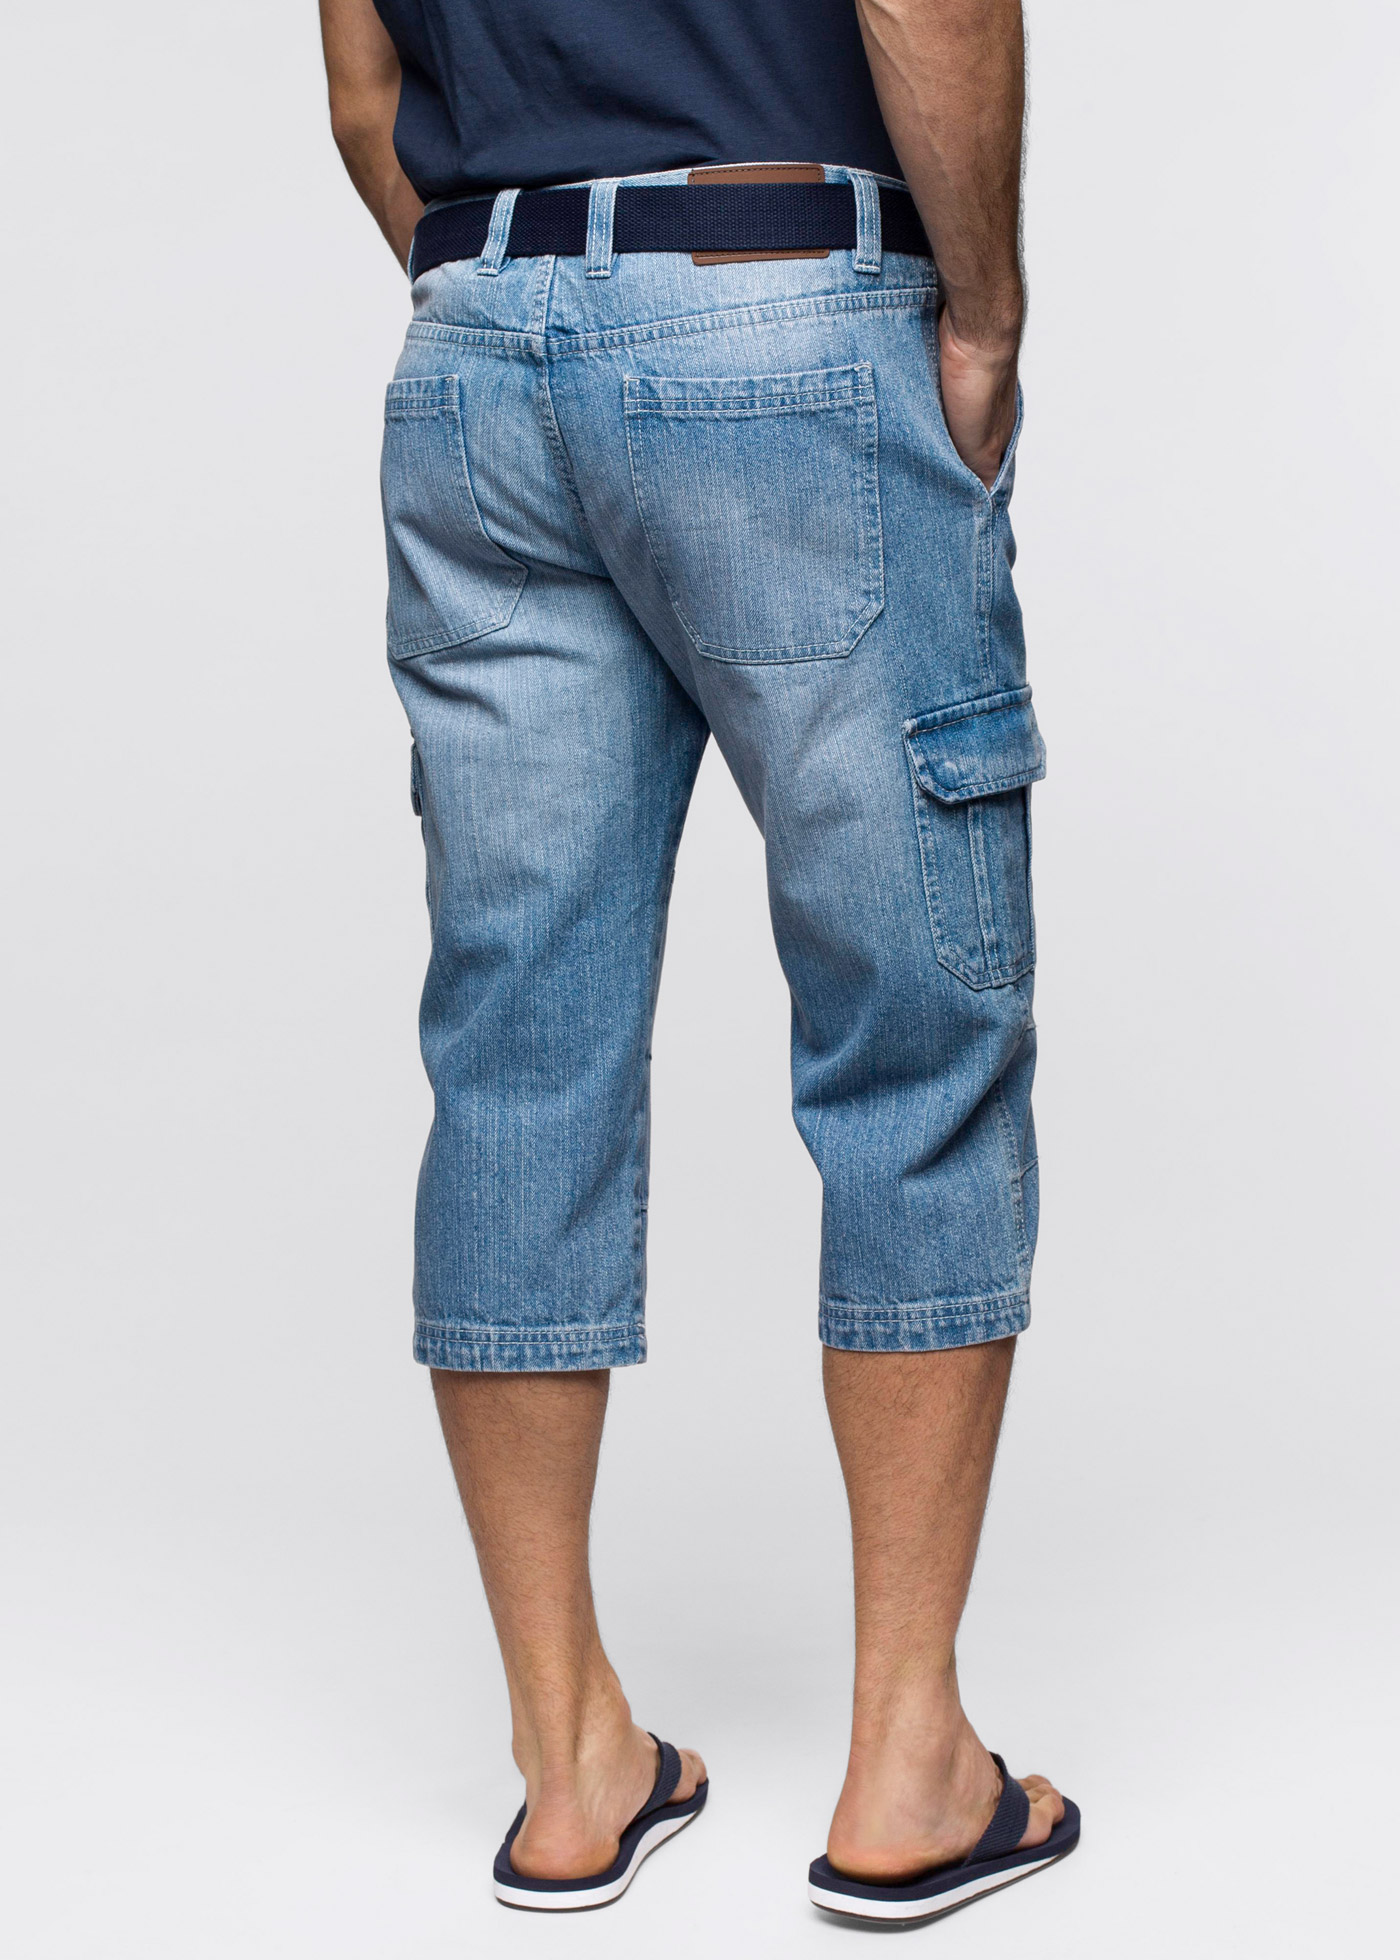 3/4-jeans, Regular Fit, John Baner JEANSWEAR, ljusblå